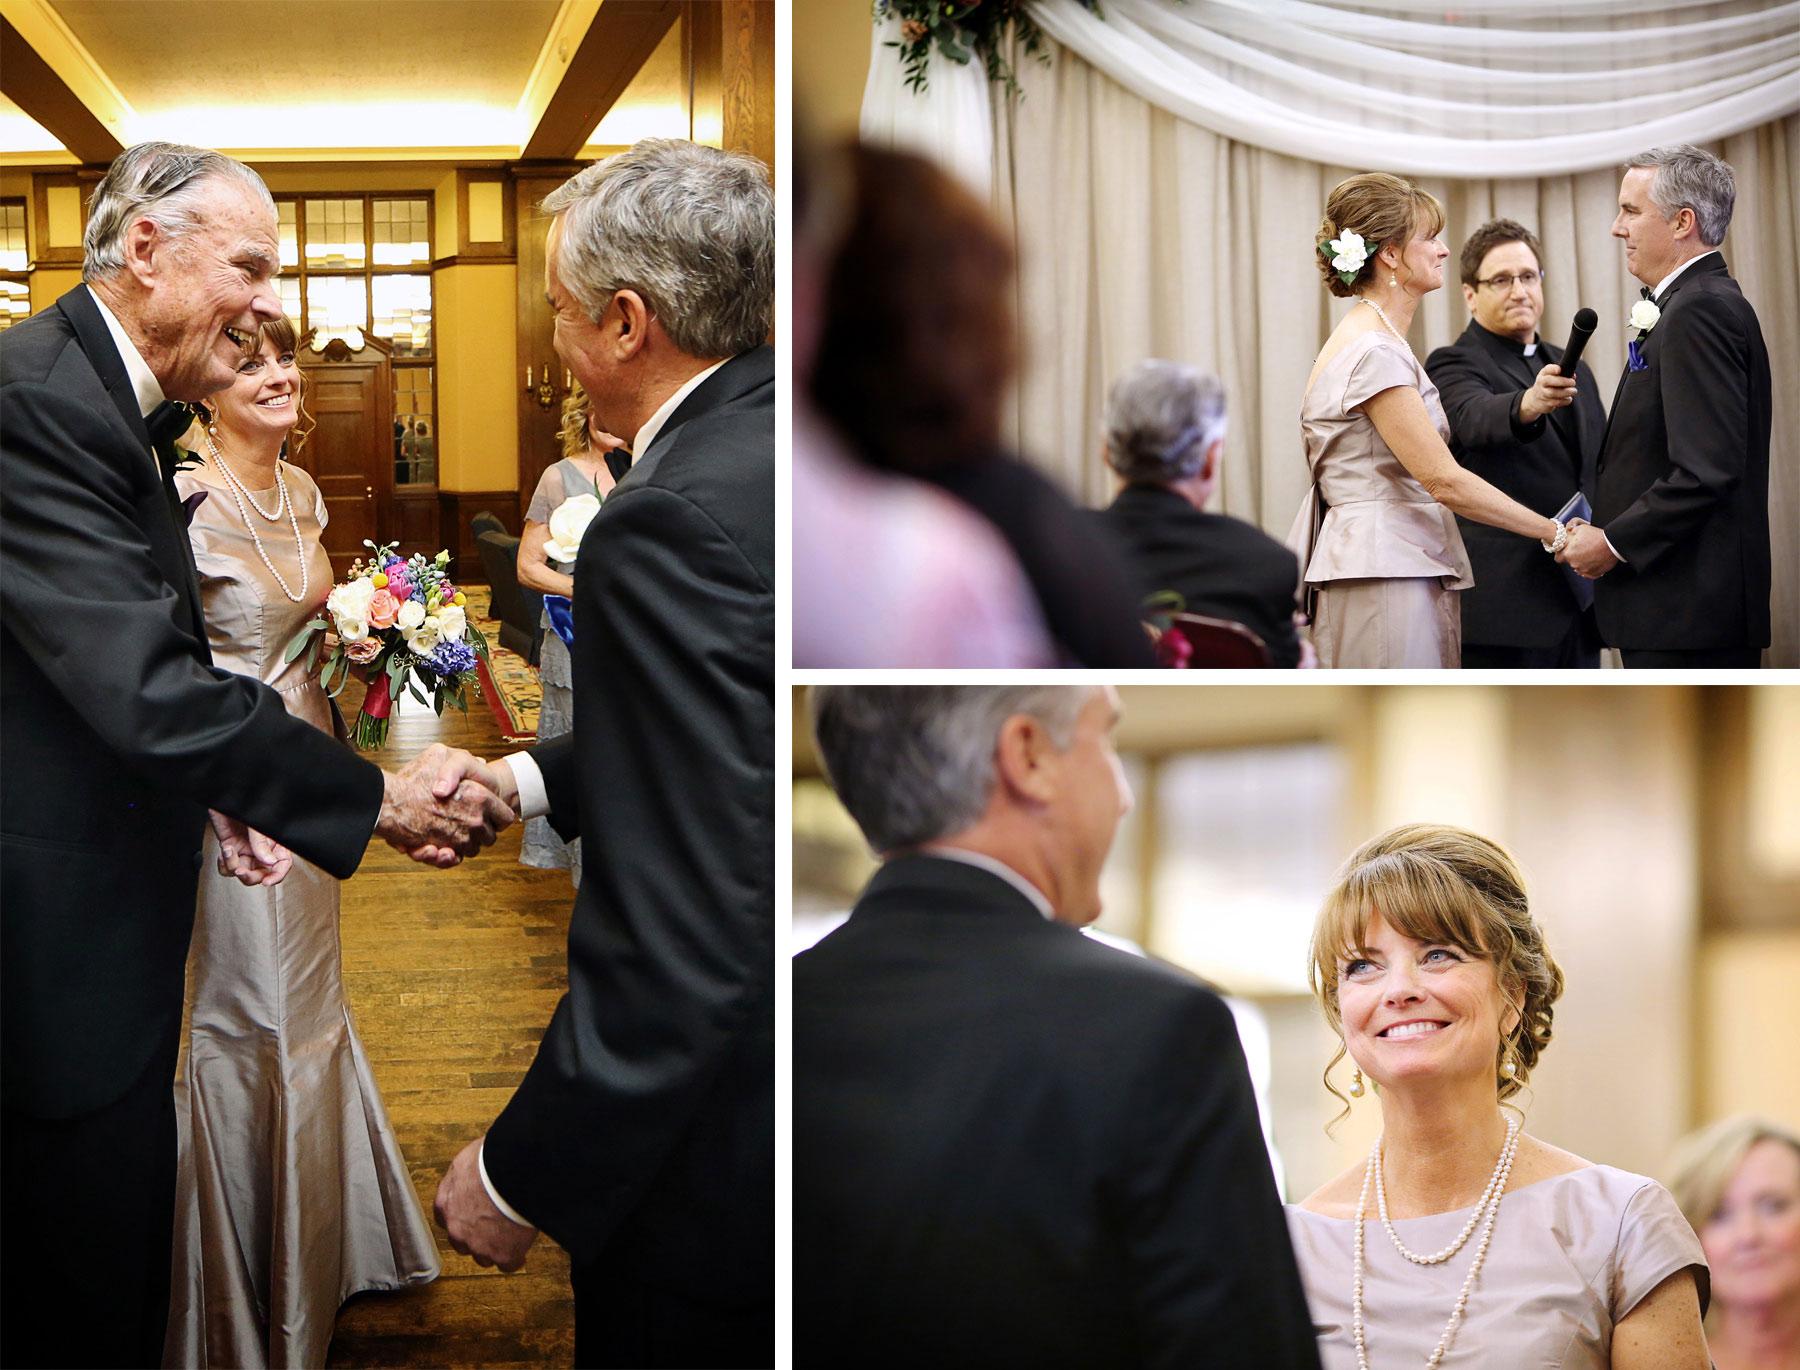 07-Minneapolis-Minnesota-Wedding-Photography-by-Vick-Photography-Downtown-The-Minneapolis-Club-Mansion-Ceremony-Tonia-and-Paul.jpg